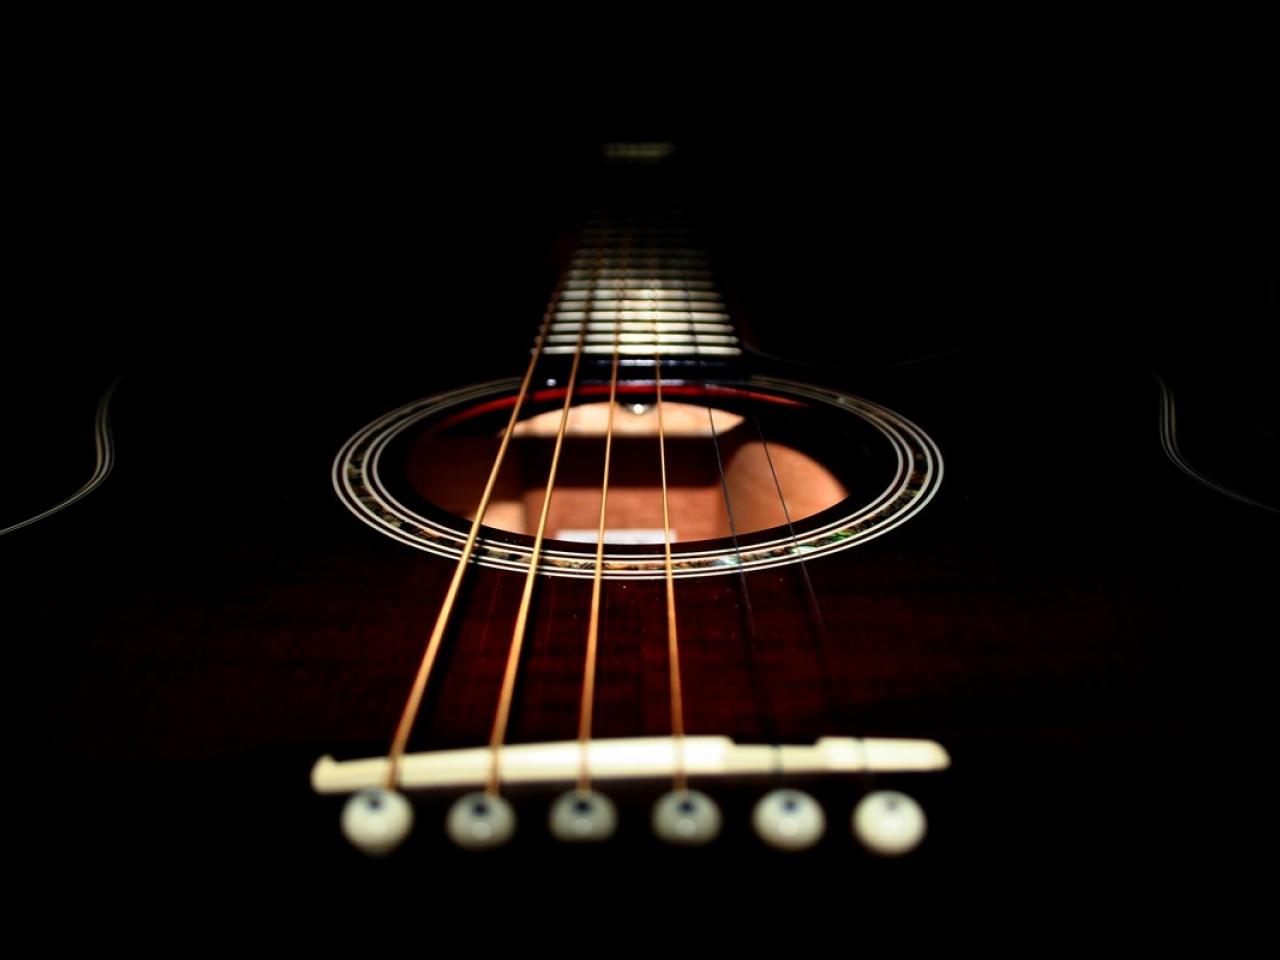 http://4.bp.blogspot.com/_ecNZSVR4JCI/TPetnTShjhI/AAAAAAAAAOE/zkntVW0RwE4/s1600/Guitarra.jpg